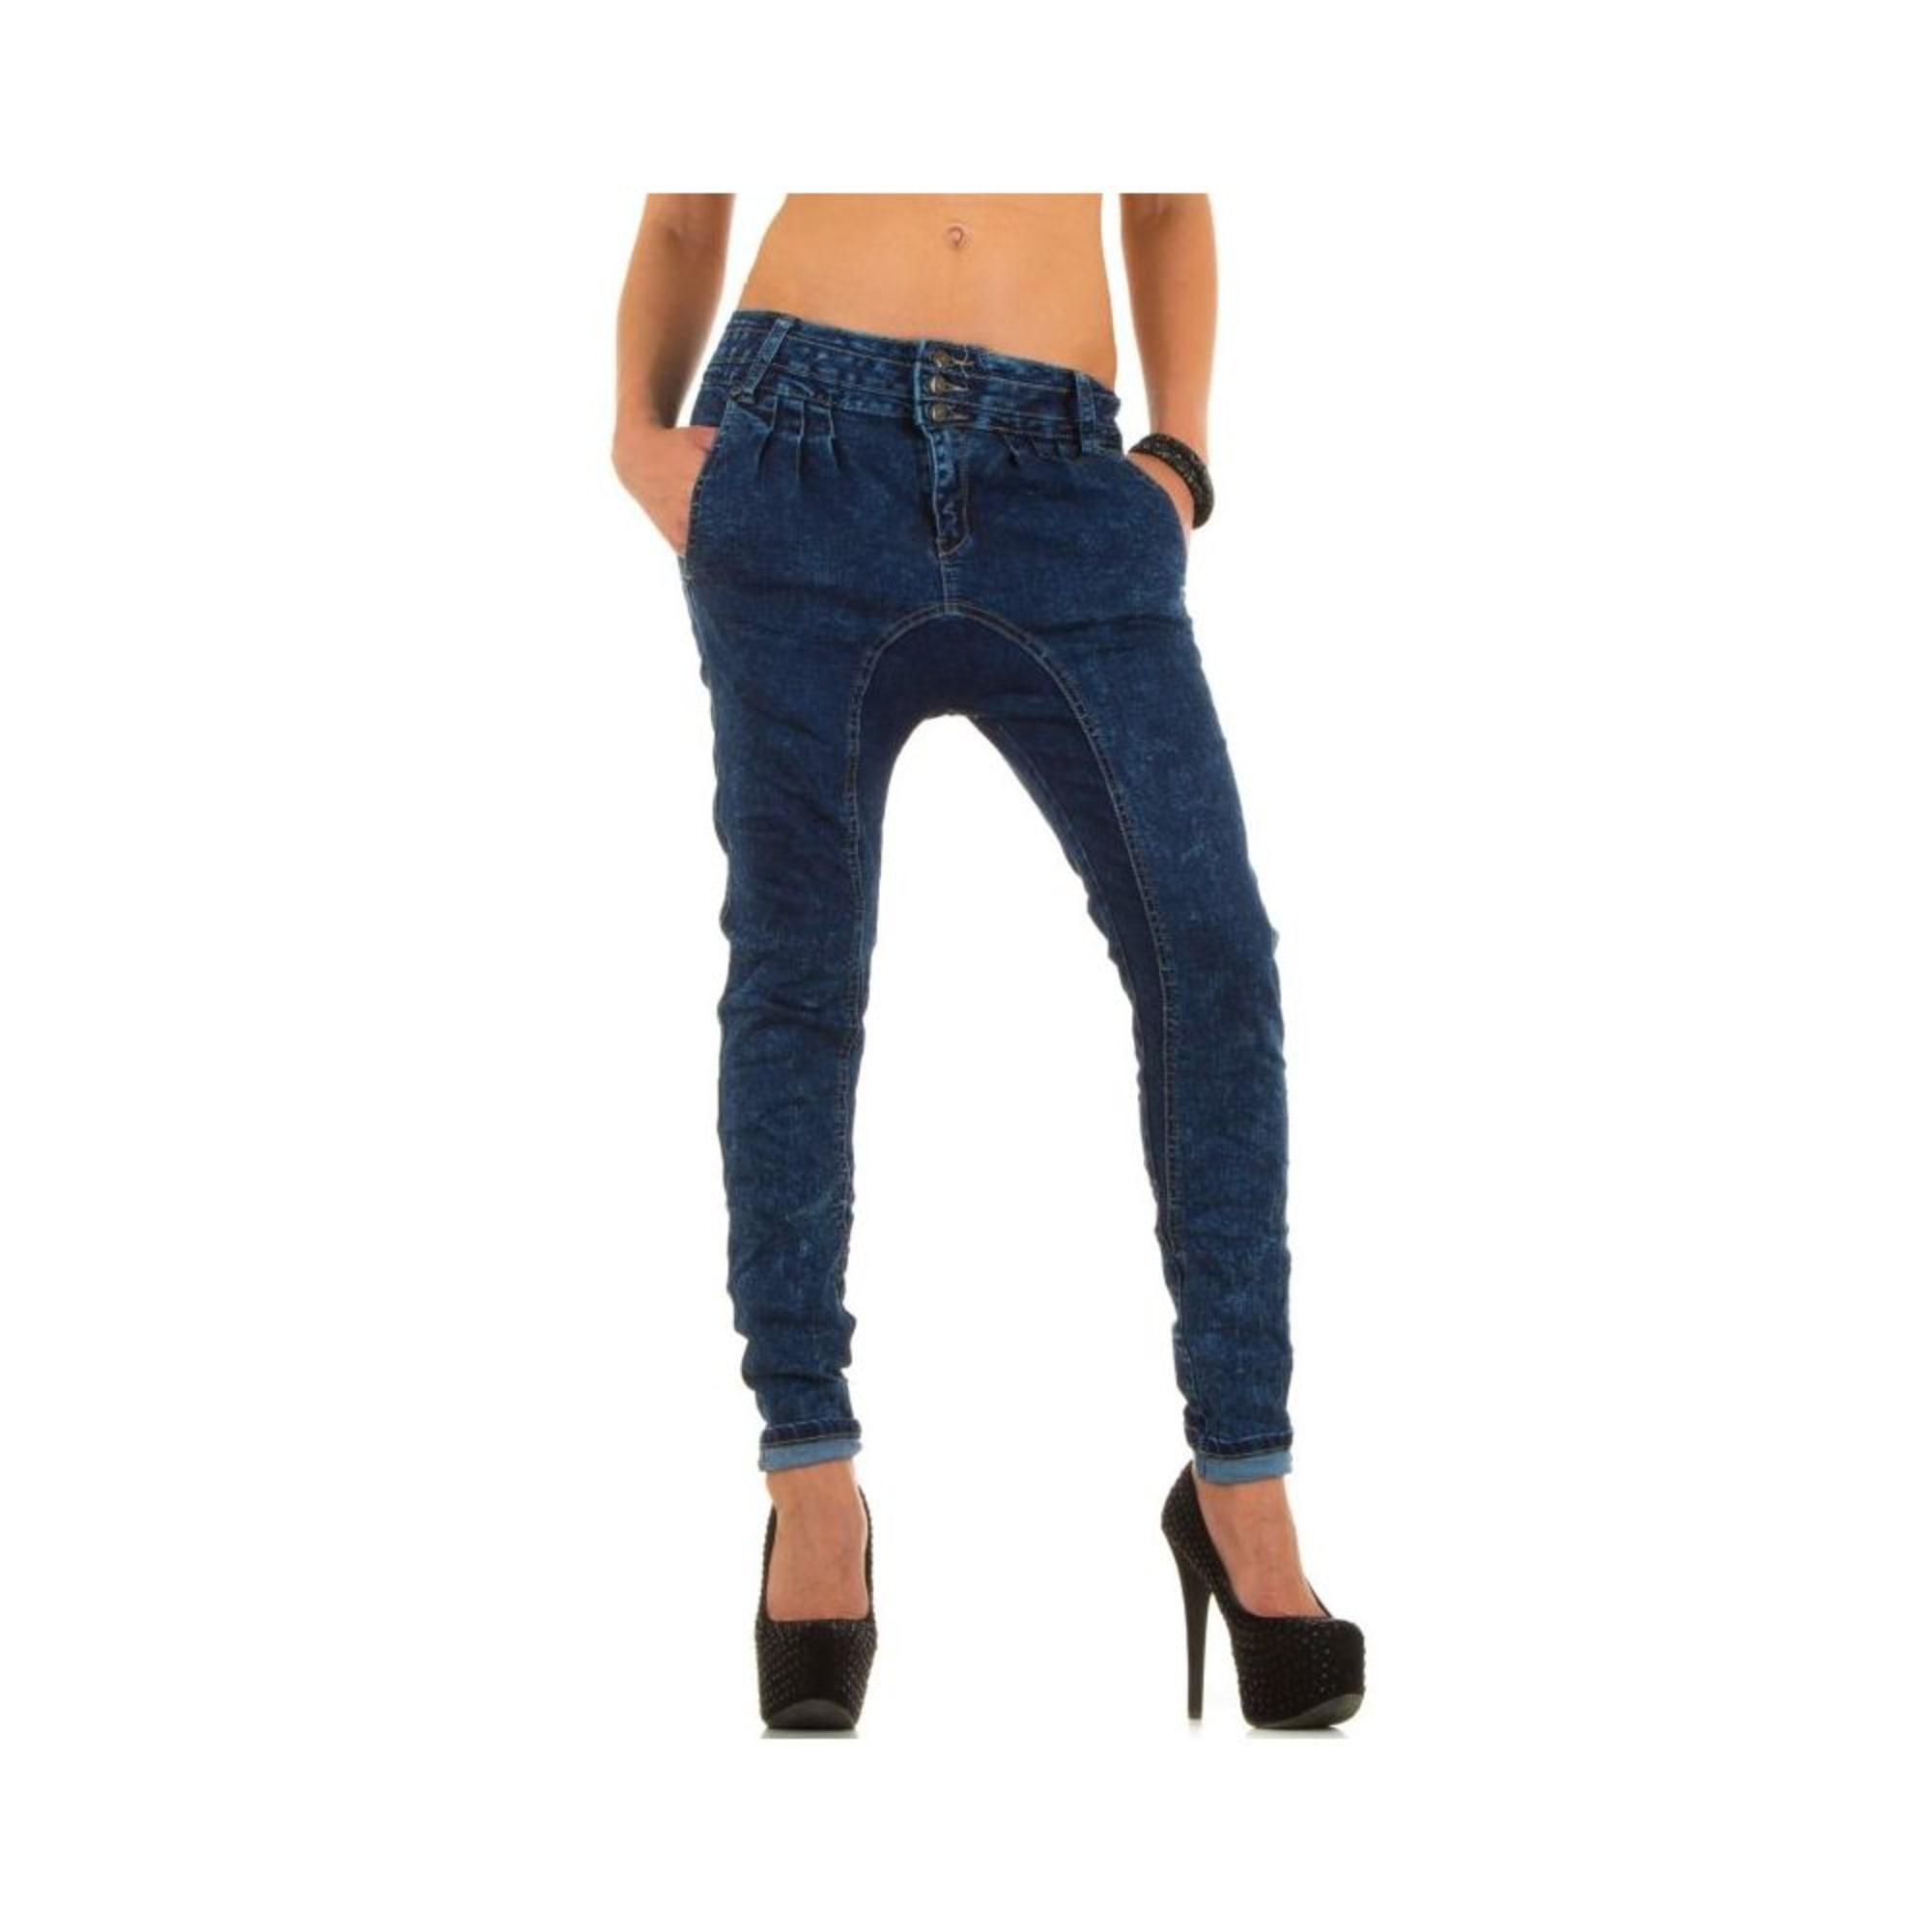 Jeans large, boyfriend SIMPLY CHIC Bleu, bleu marine, bleu turquoise